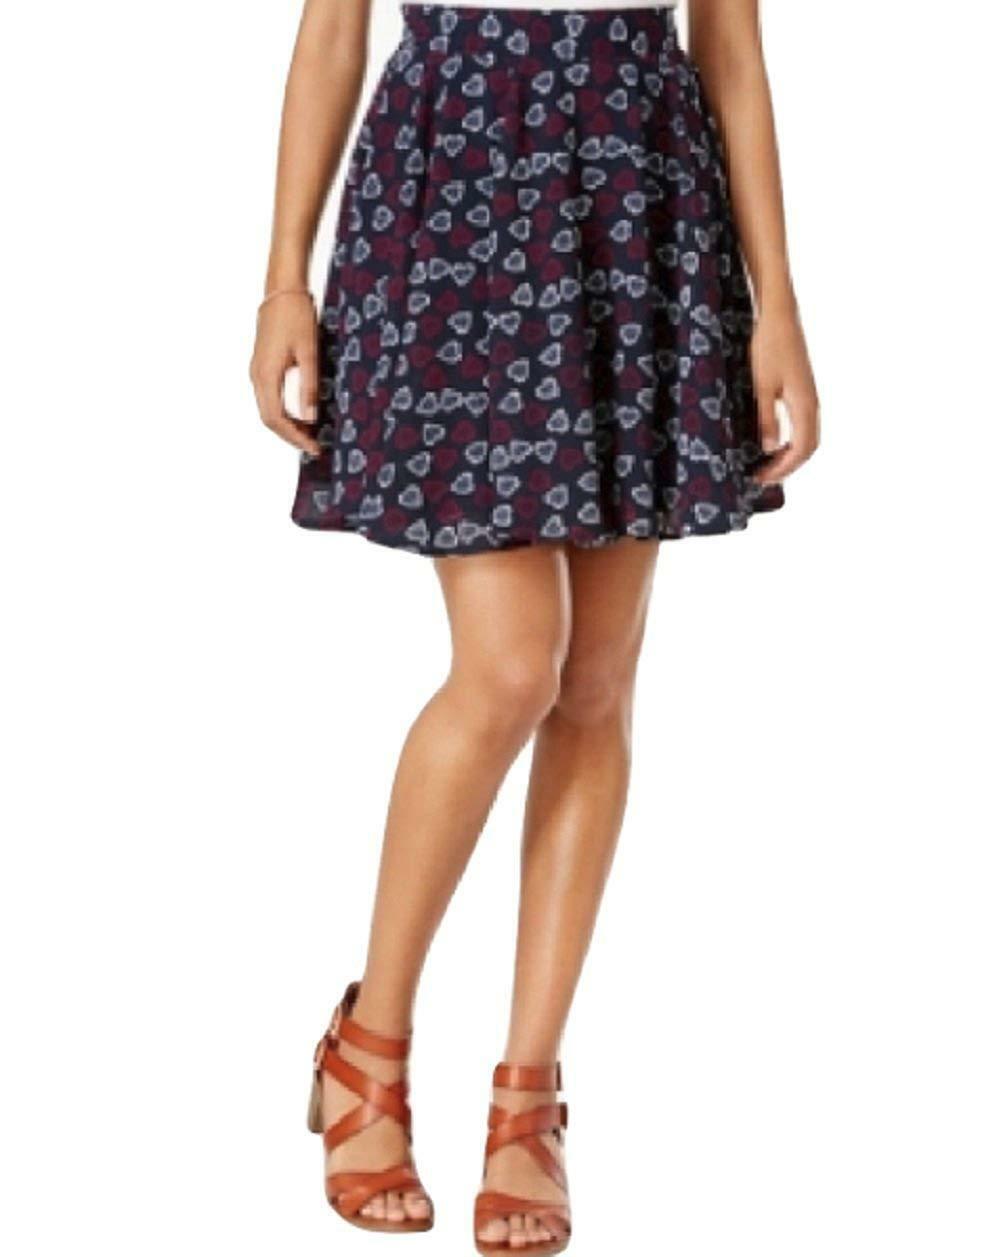 Maison Jules Heart-Print Flare Skirt Navy Stone Combo XXL